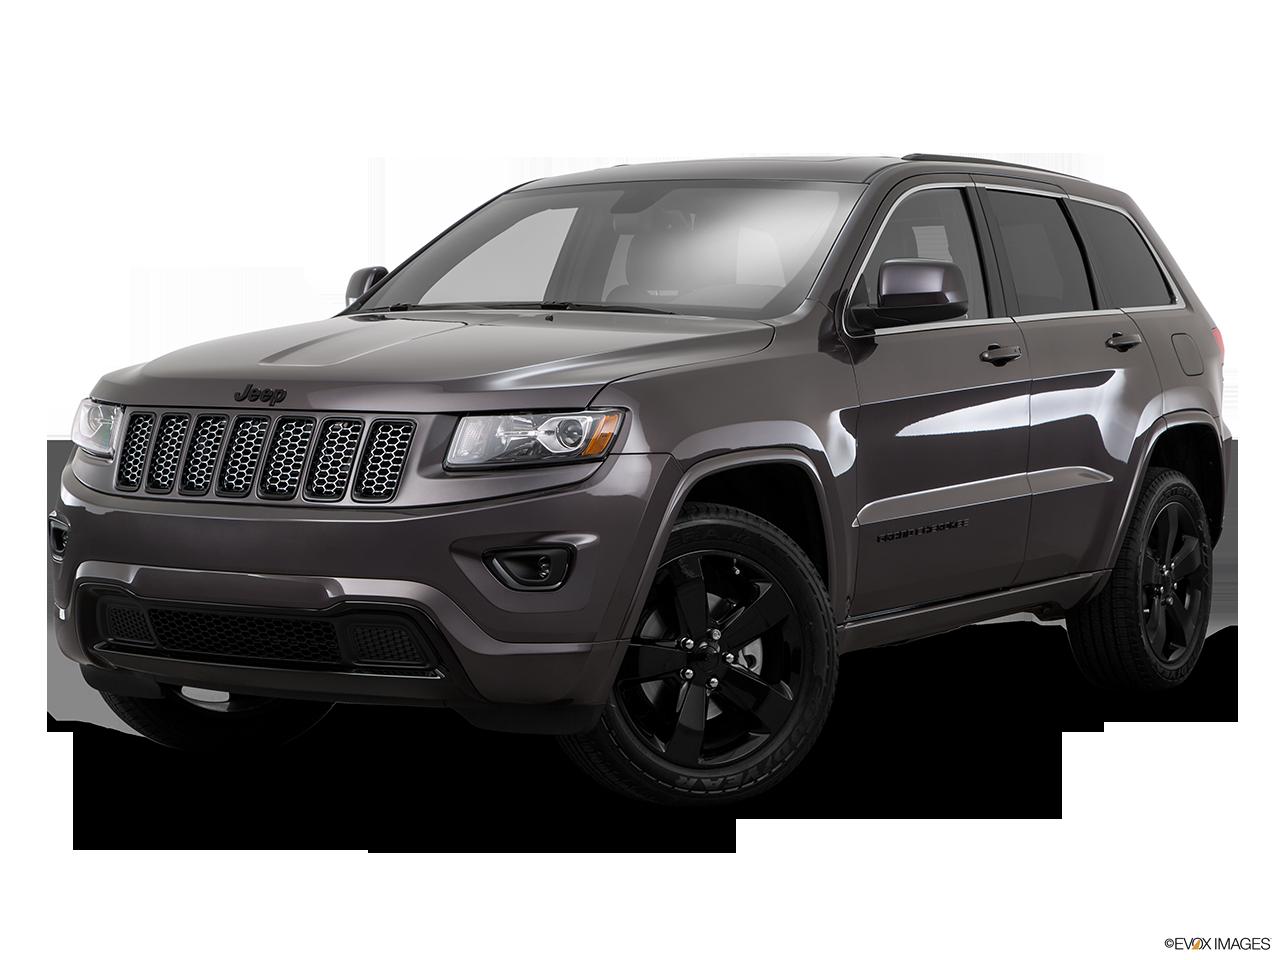 Test Drive A 2015 Jeep Grand Cherokee at Huntington Beach Chrysler Dodge Jeep Ram in Huntington Beach